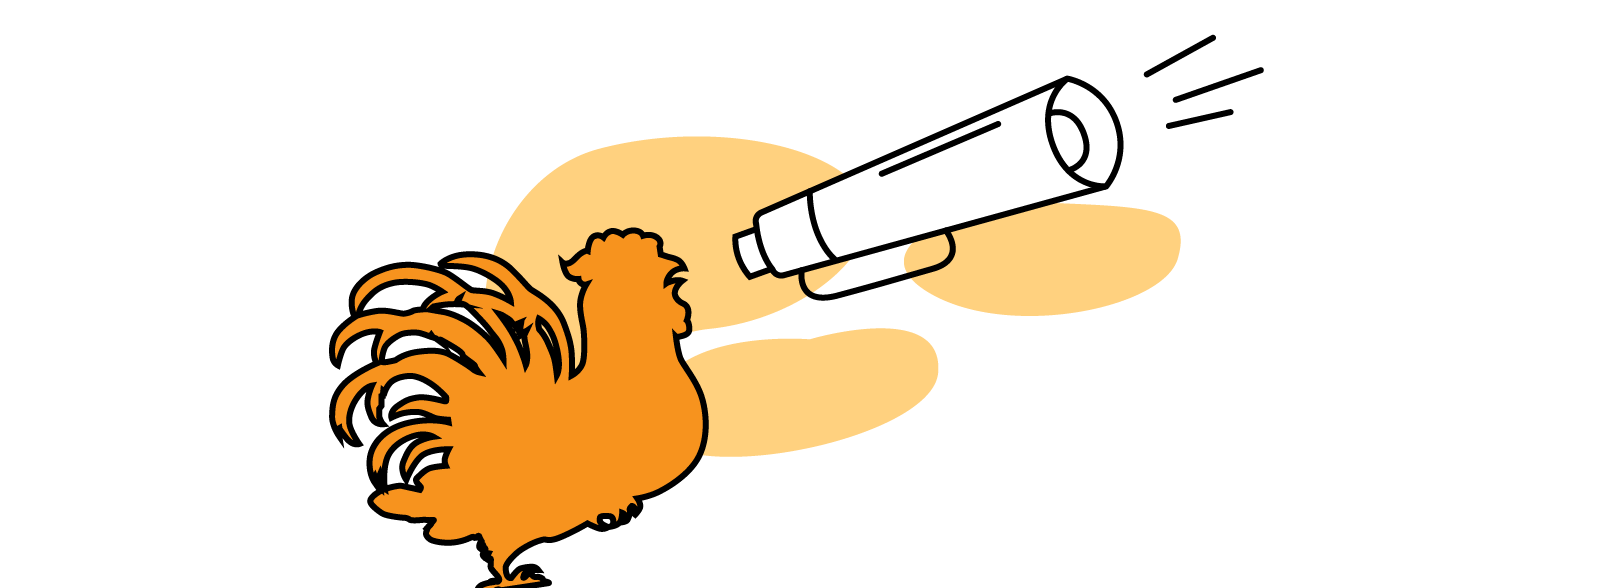 cseas chicken with loudspeaker